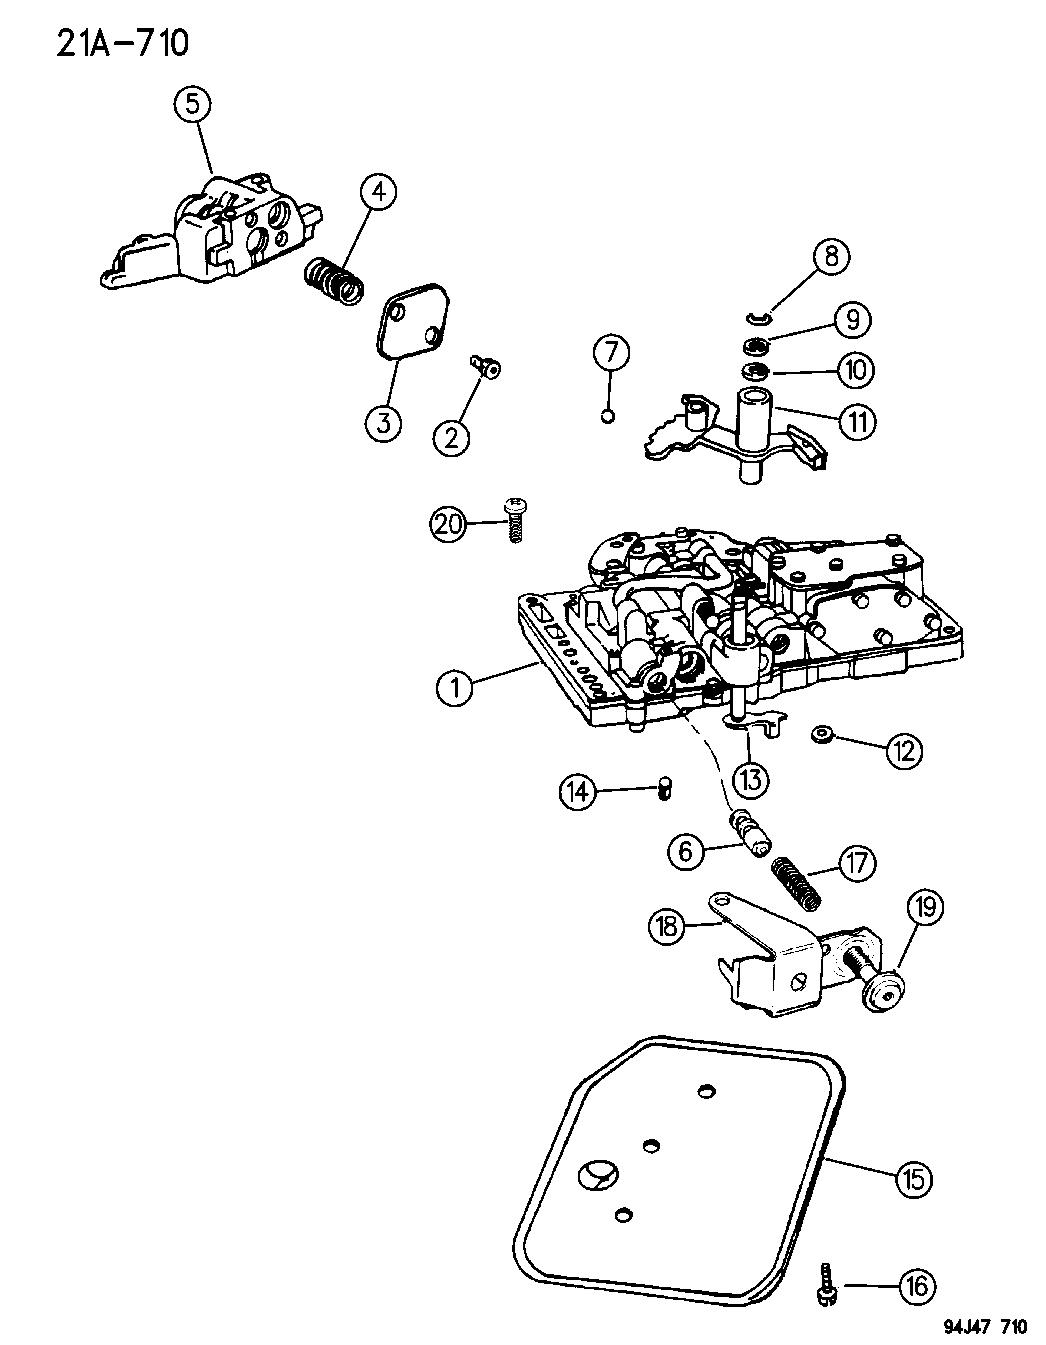 1994 Jeep Wrangler Valve Body & Electronic Control